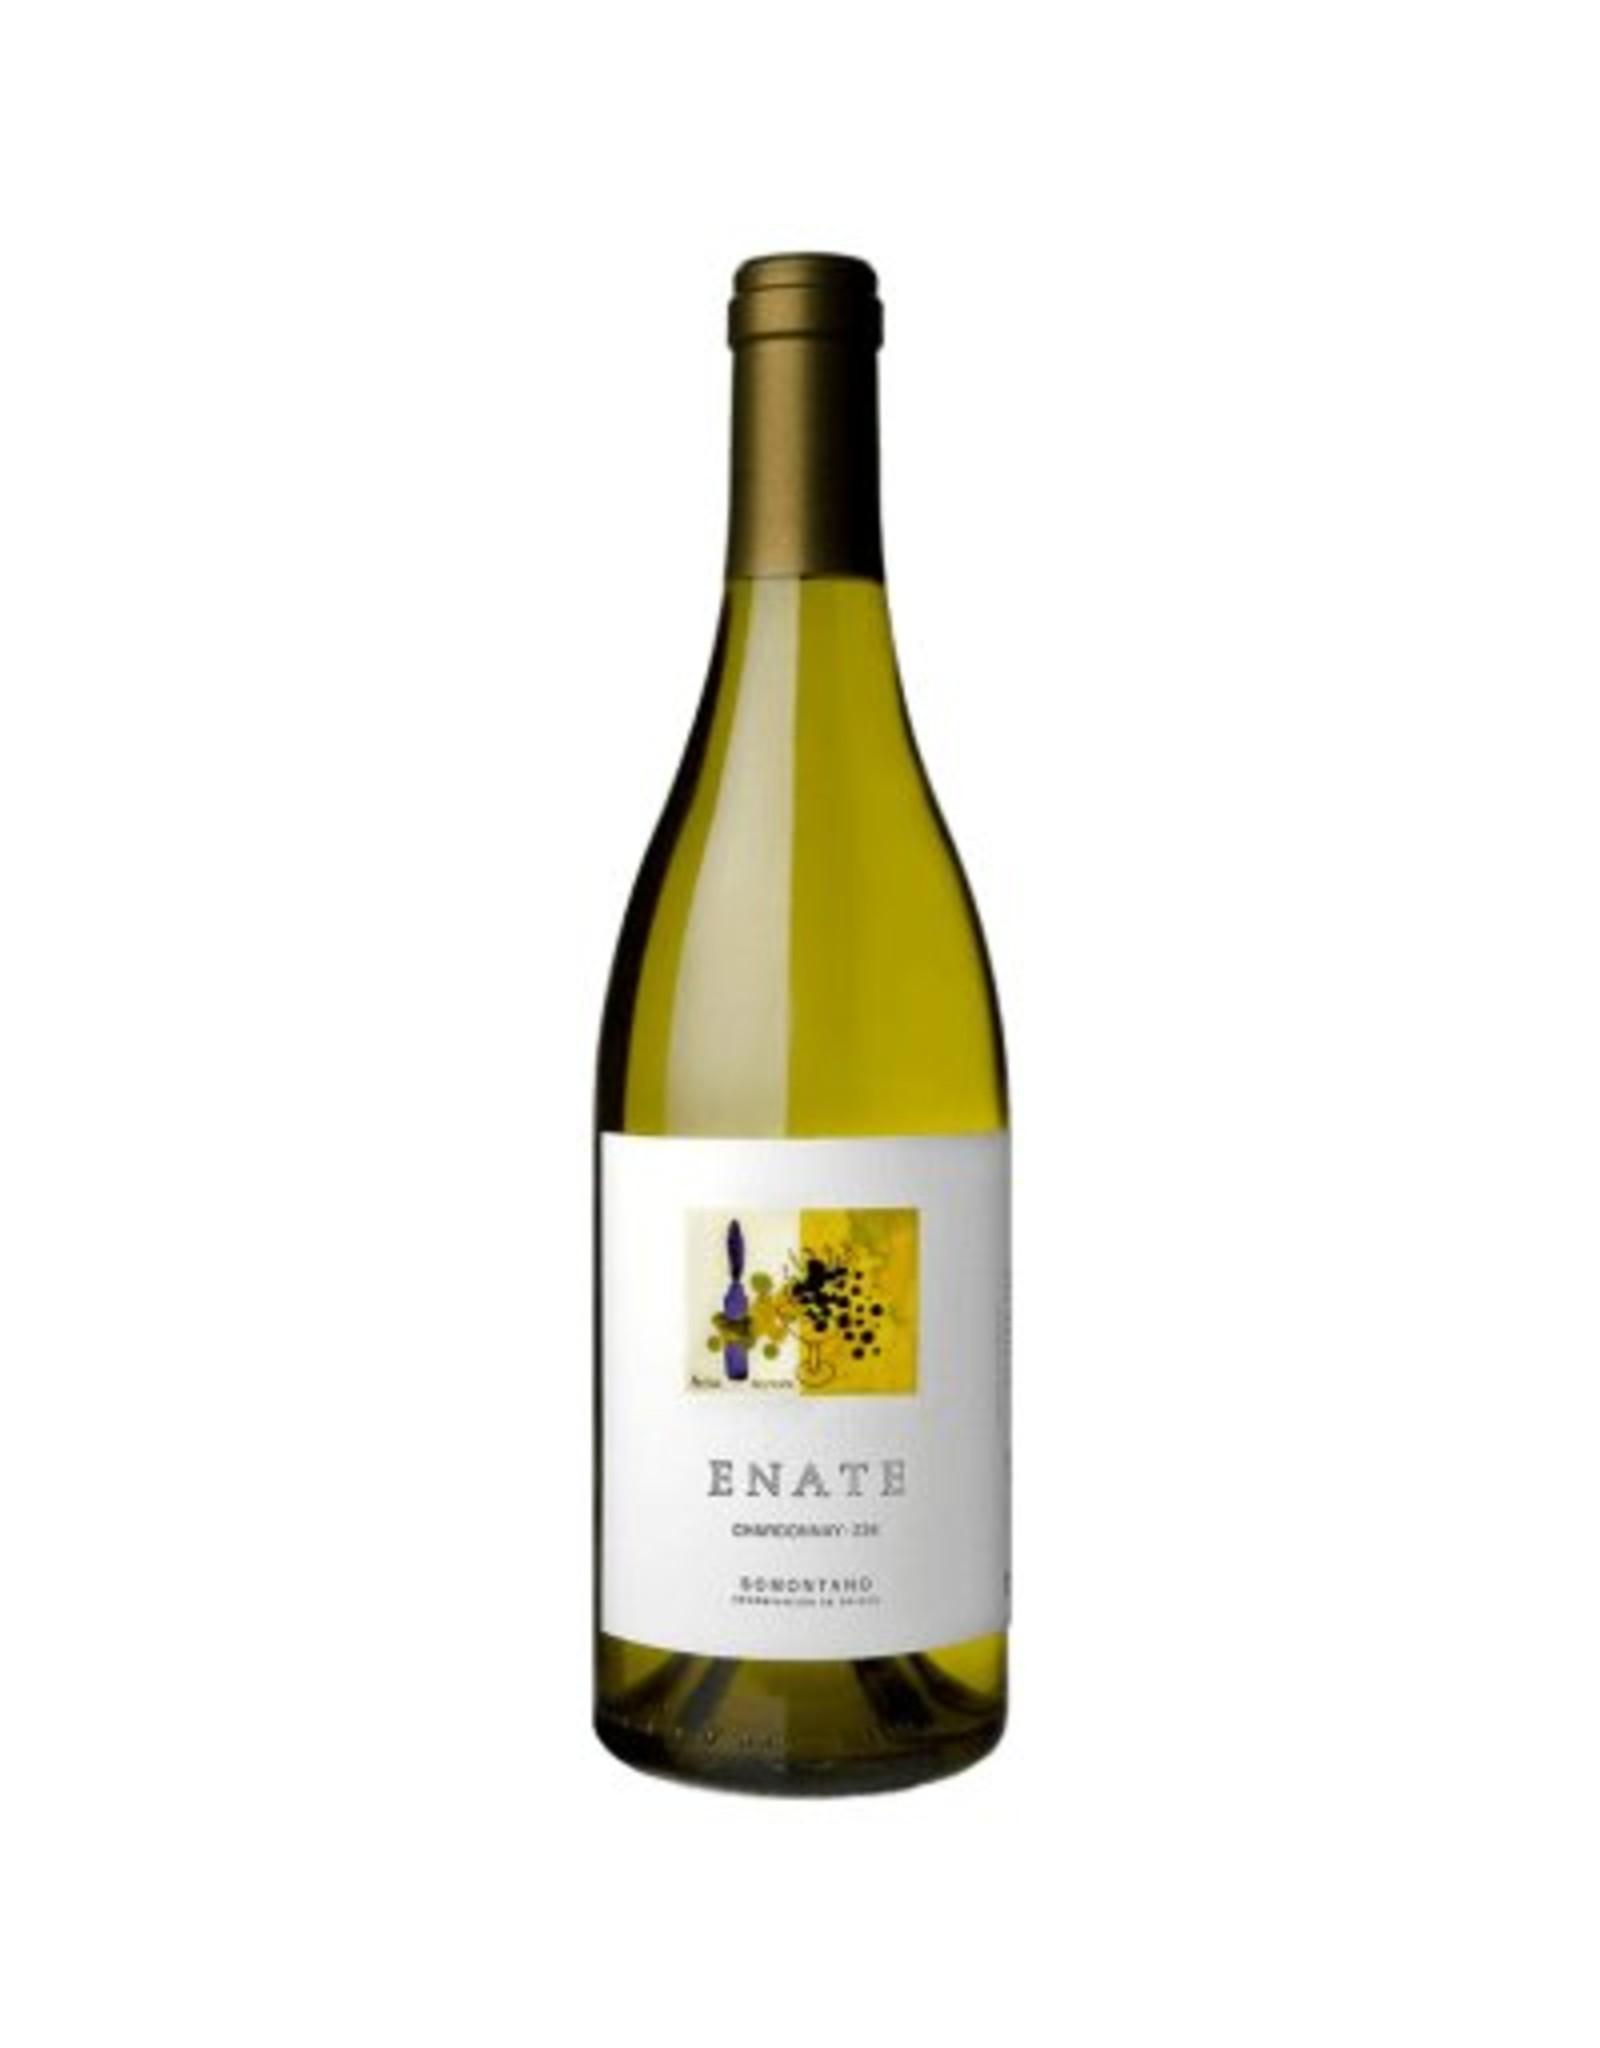 ENATE Chardonnay '234', 2012